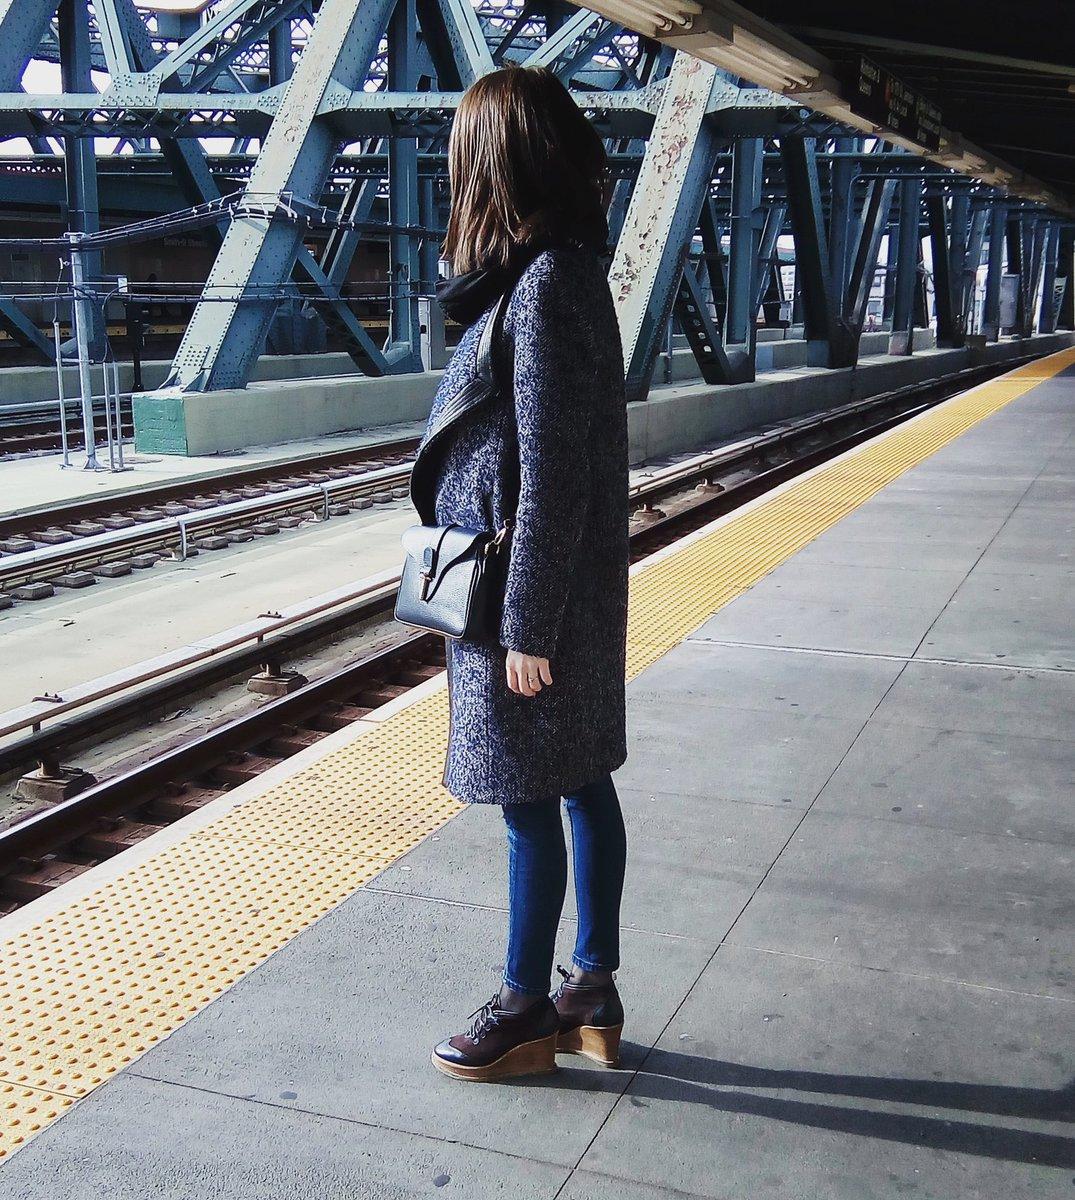 Today at the  subway station #fashionlook #asos #soïaandkyo #comptoirdescotonniers #StreetStyle #NYC<br>http://pic.twitter.com/84DjuSmEqr &ndash; bij Brooklyn Bridge